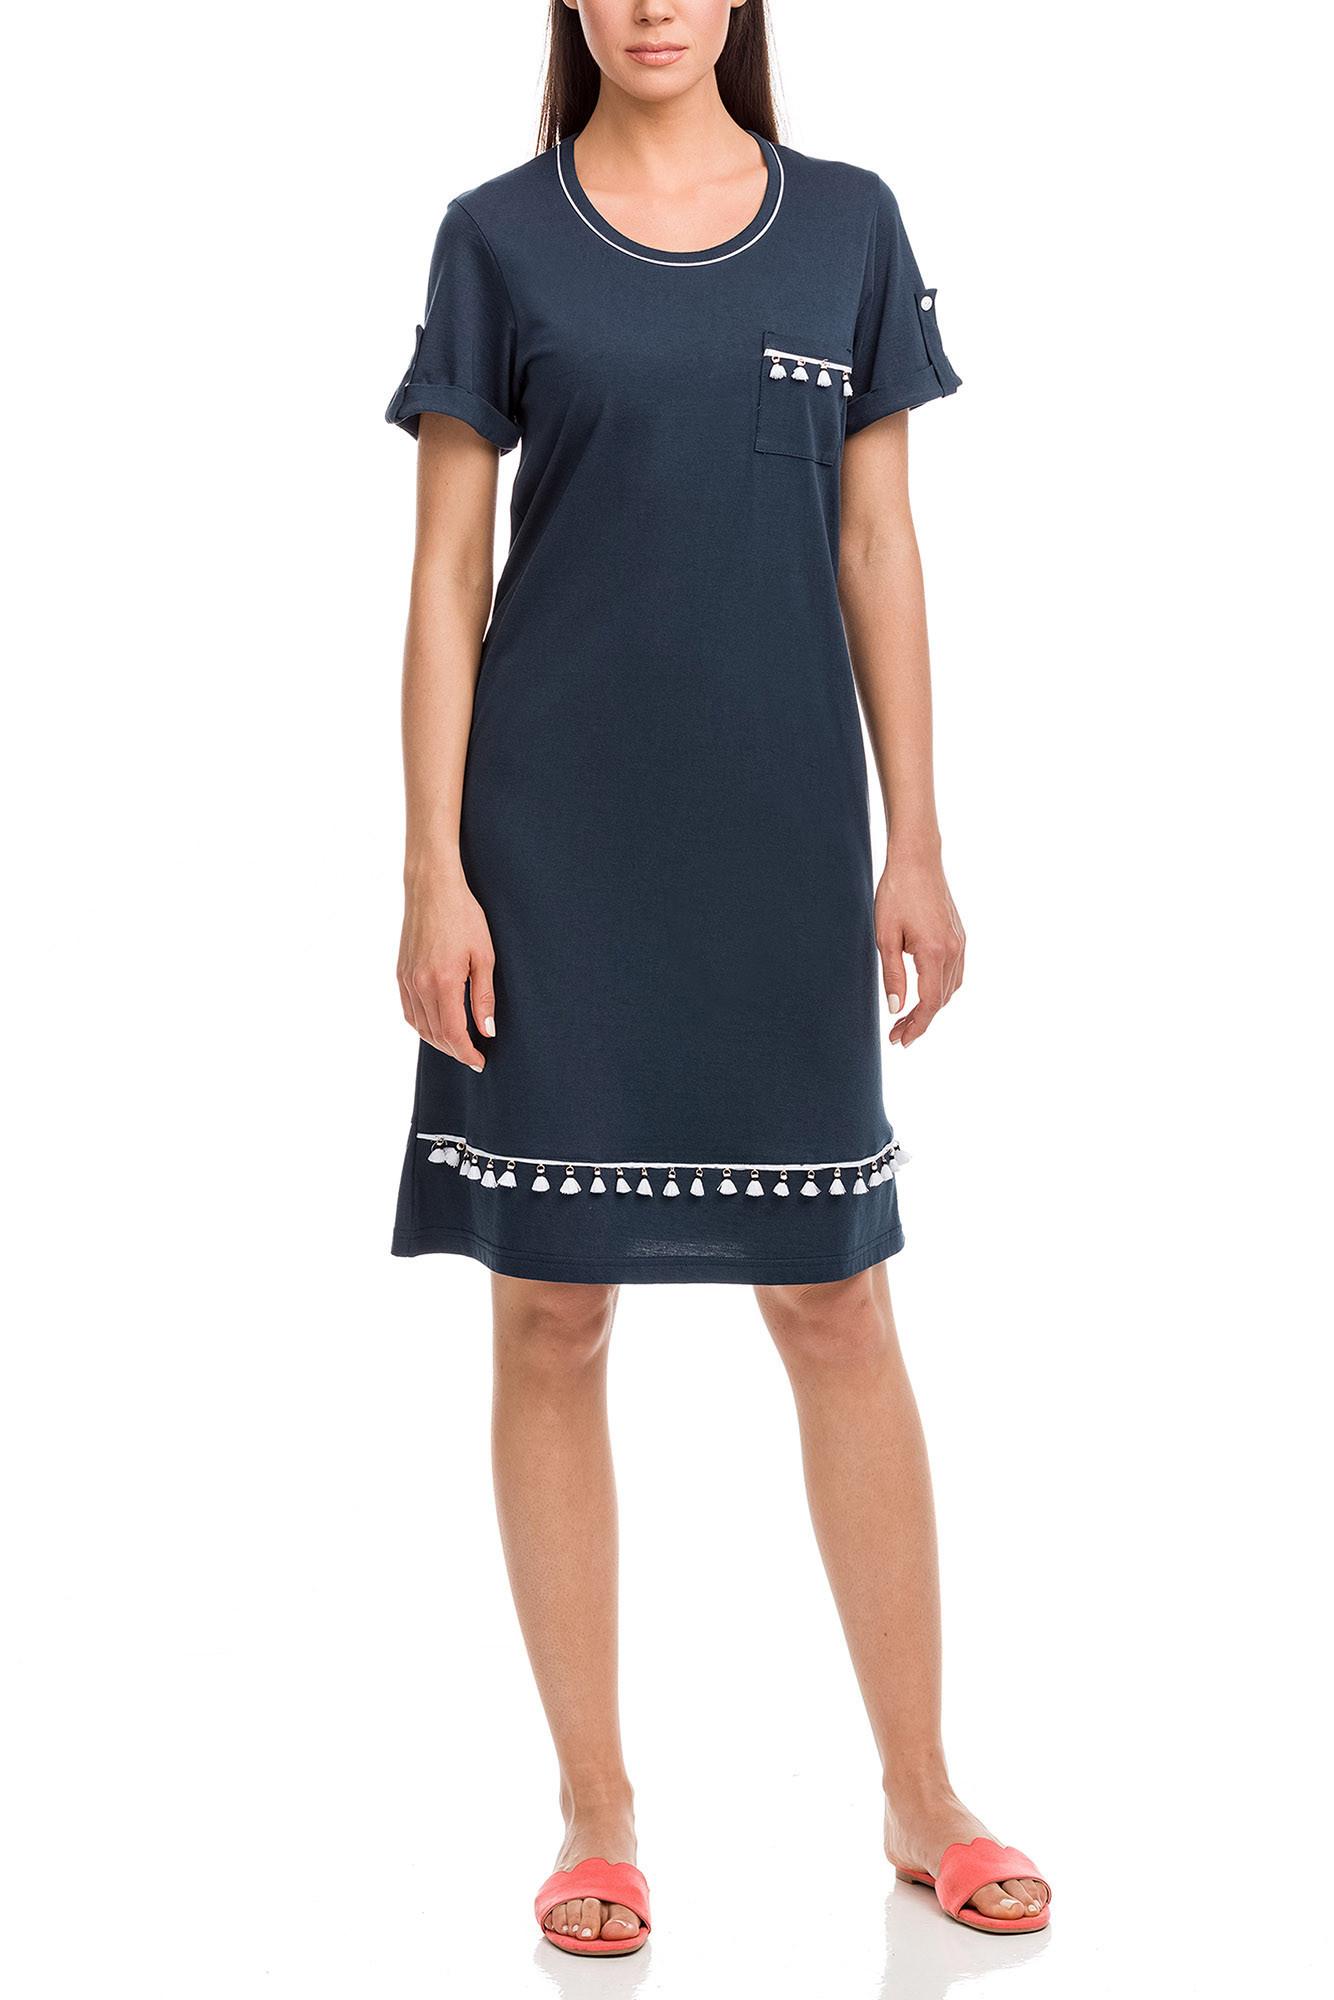 Vamp - Dámske šaty 12595 - Vamp blue oxford 3XL